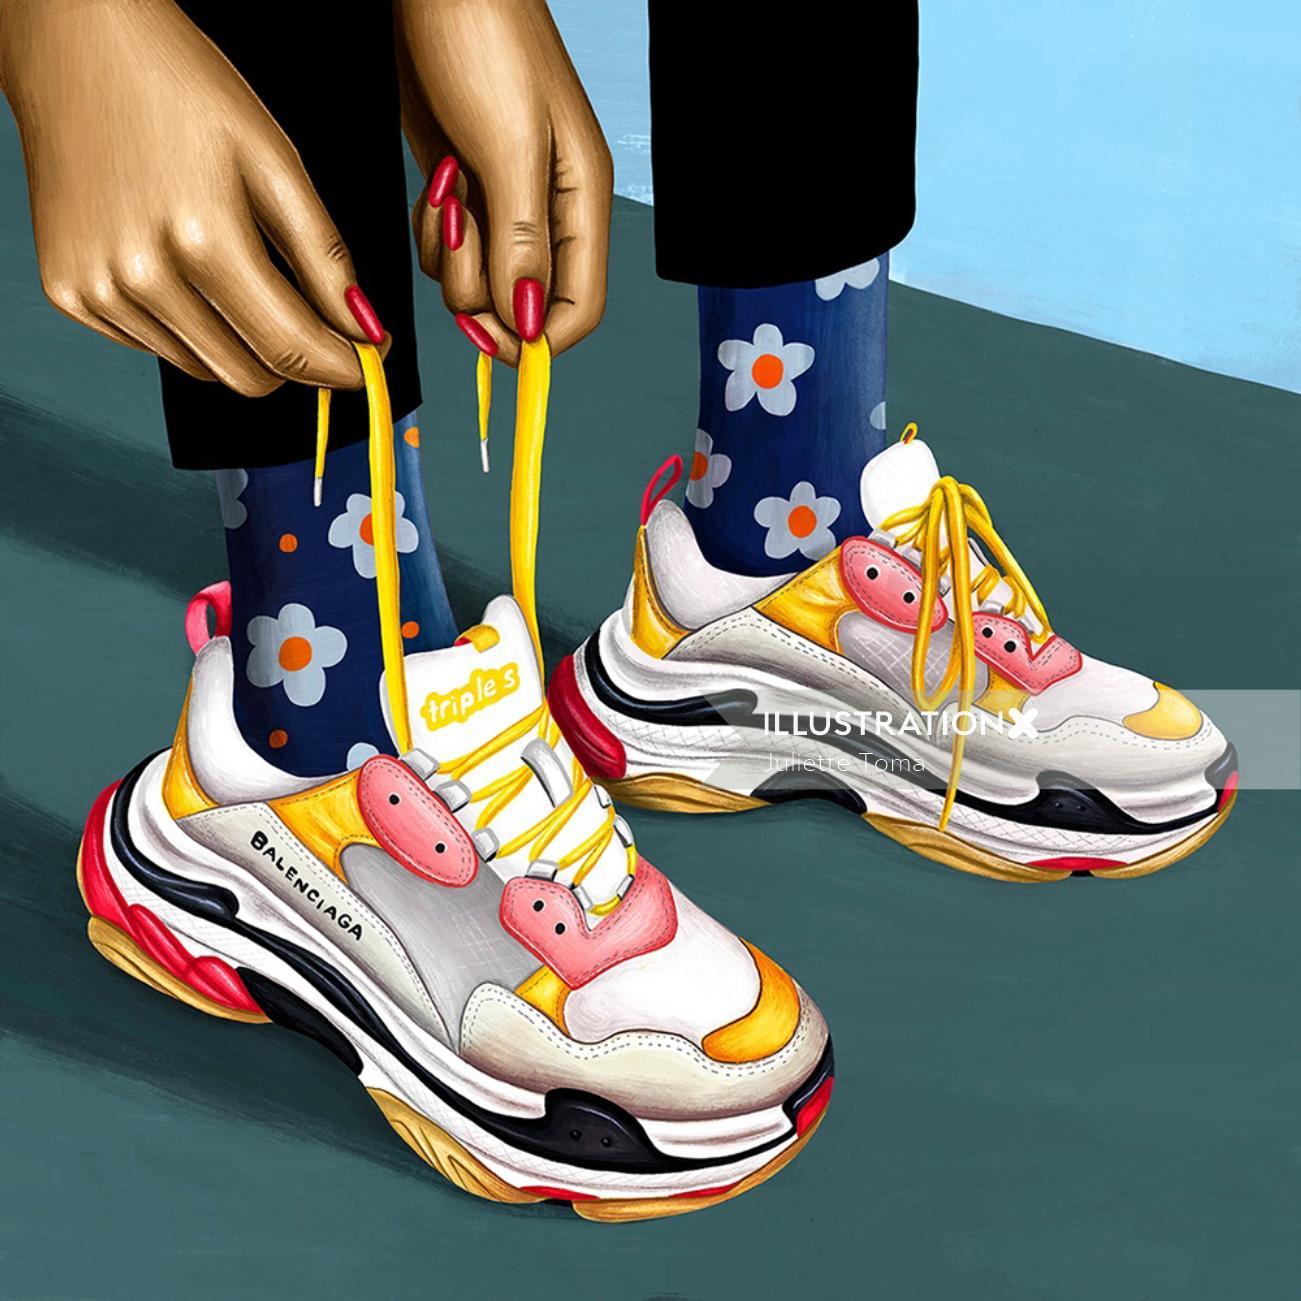 Graphic illustration of Balenciaga shoes